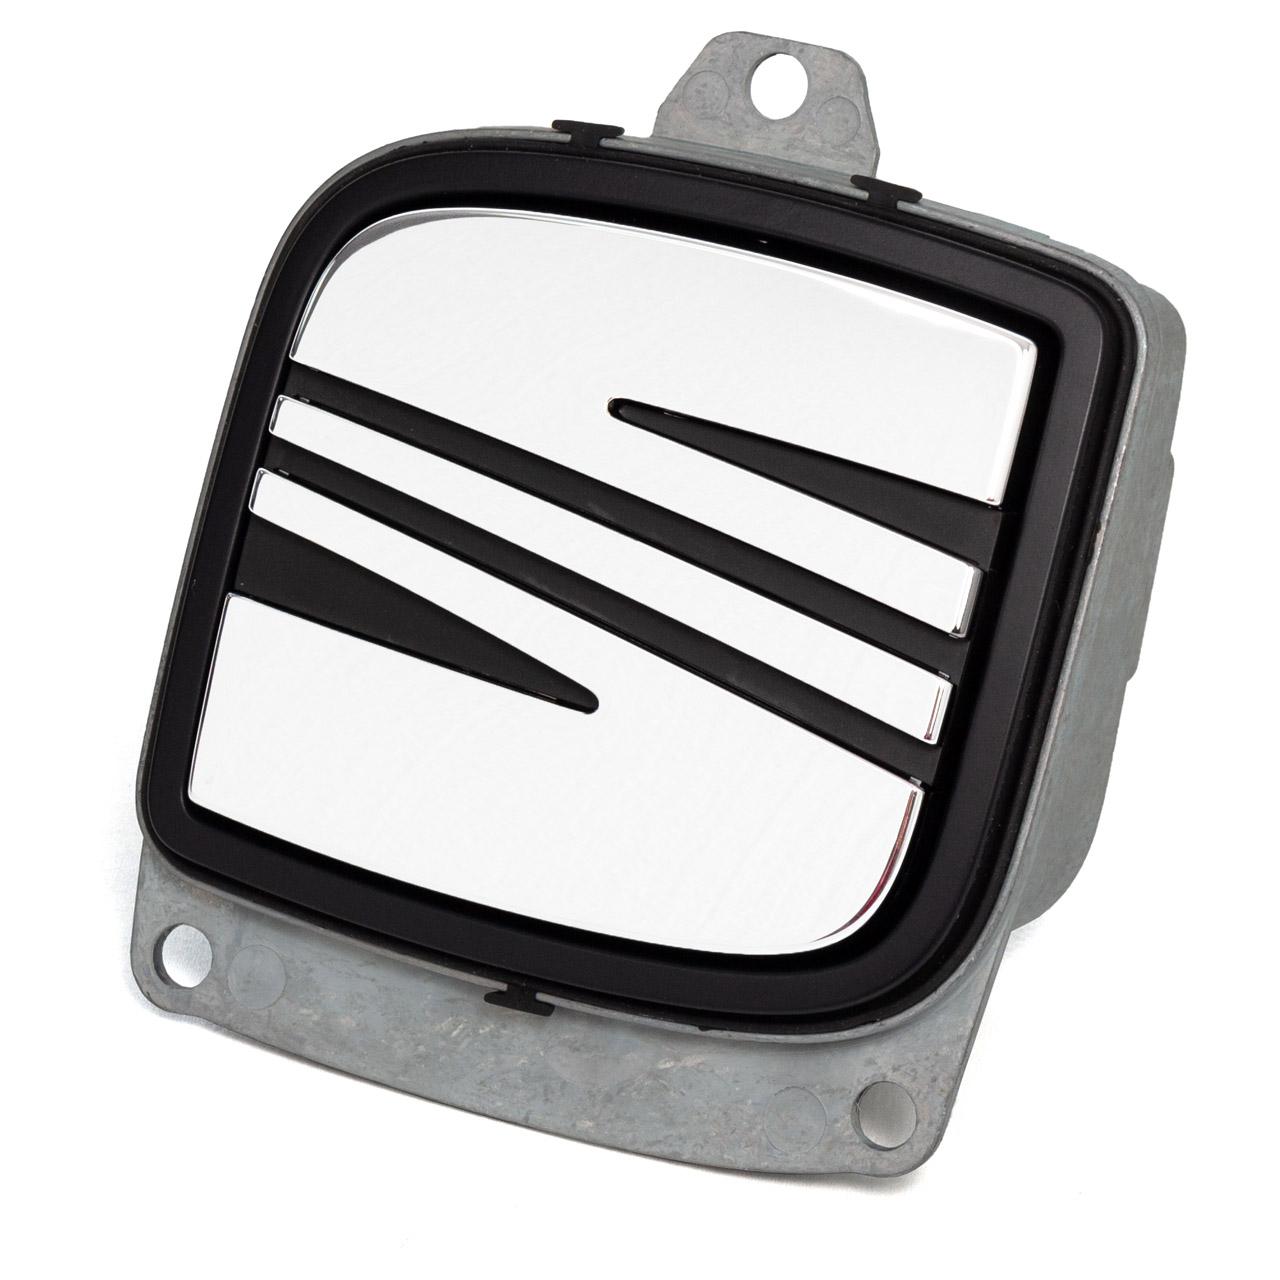 ORIGINAL SEAT Heckklappengriff Öffner + Emblem Leon 1P Toledo 3 Altea 5P0827565D